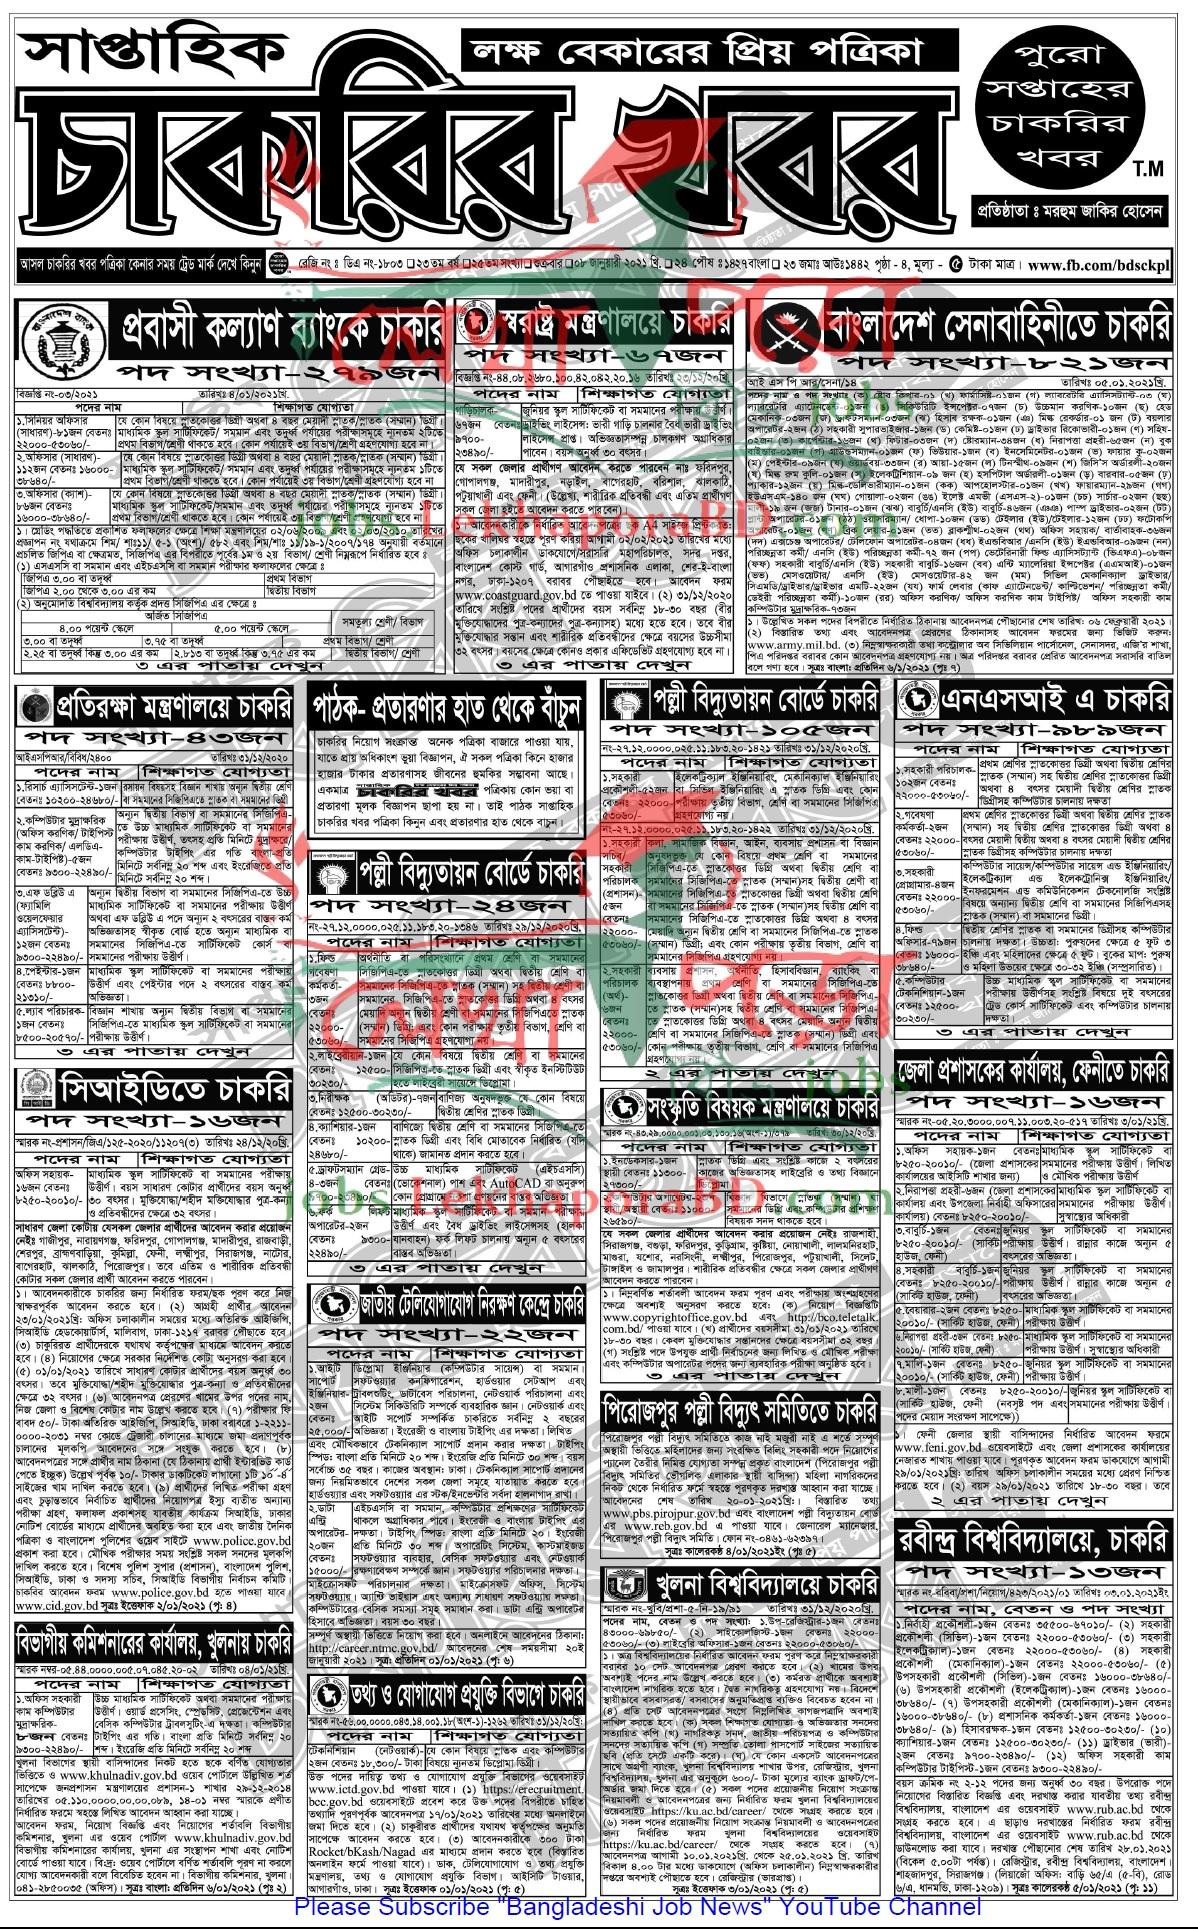 saptahik chakrir khobor potrika 08 january 2021 - সাপ্তাহিক চাকরির খবর পত্রিকা ০৮ জানুয়ারি ২০২১